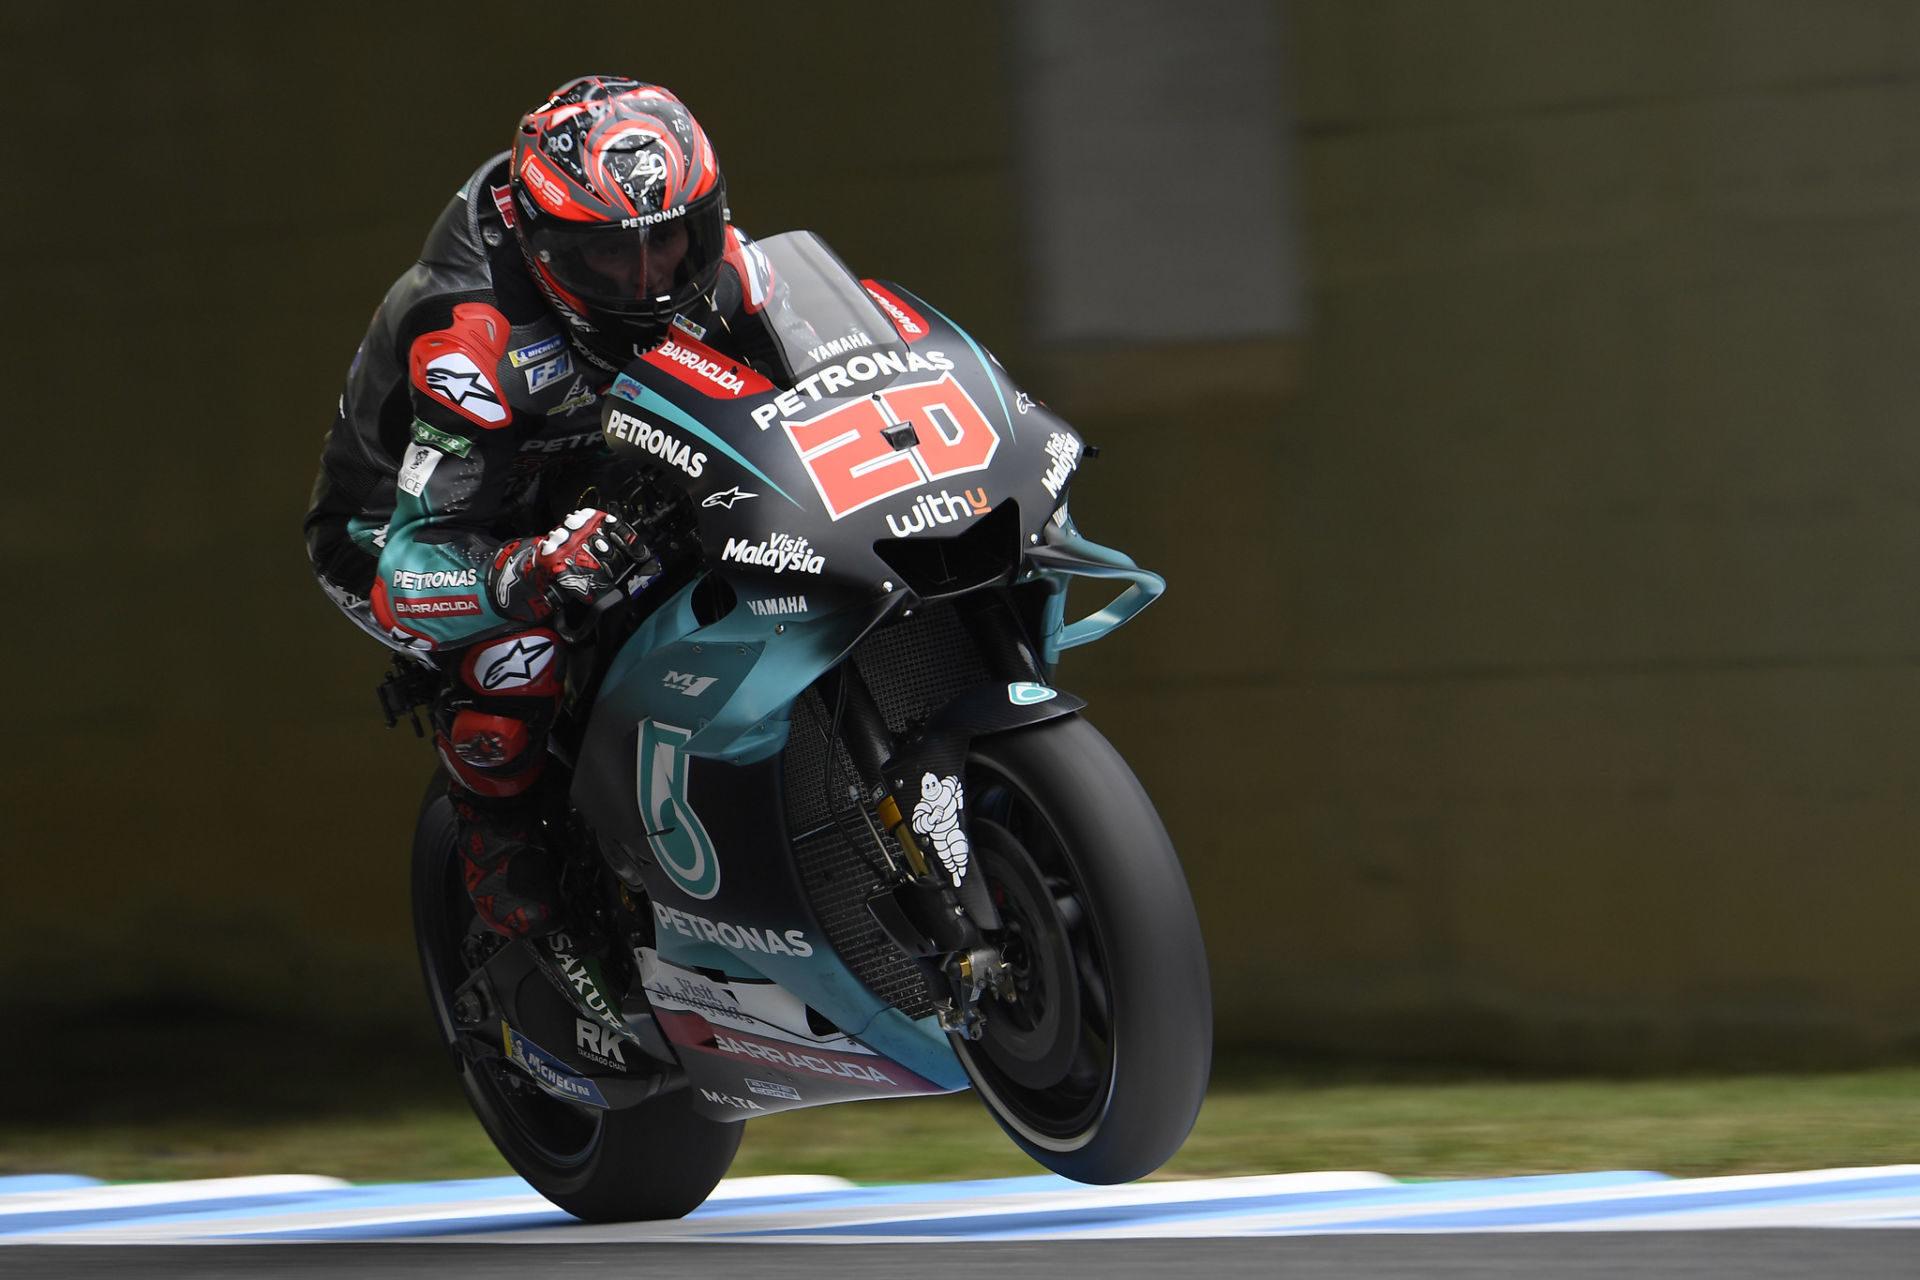 Fabio Quartararo (20) in action at Motegi. Photo courtesy of PETRONAS Yamaha Sepang Racing Team.